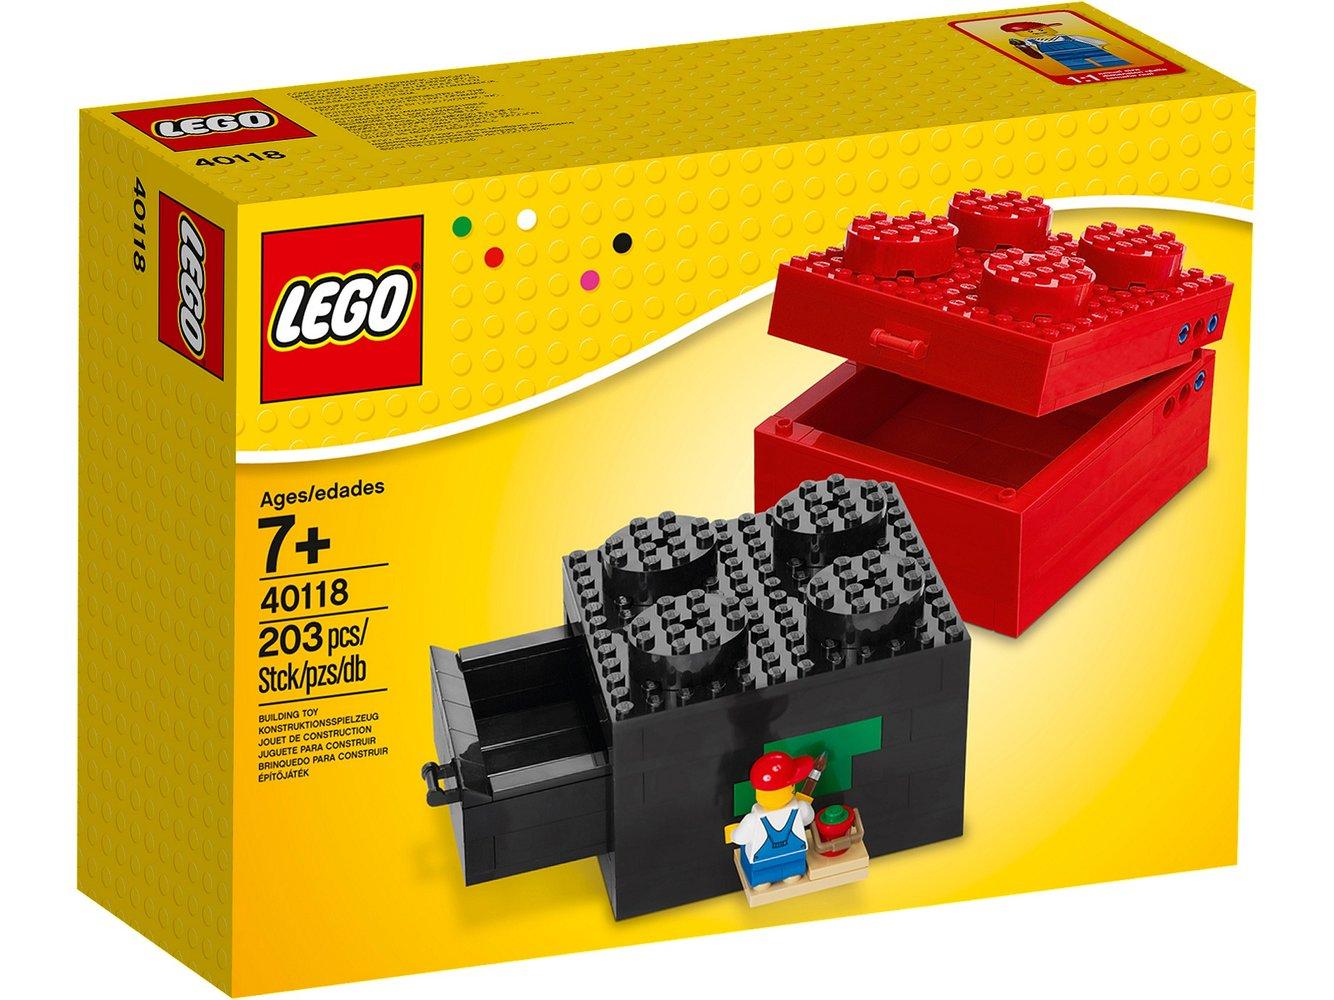 Buildable Brick Box 2x2